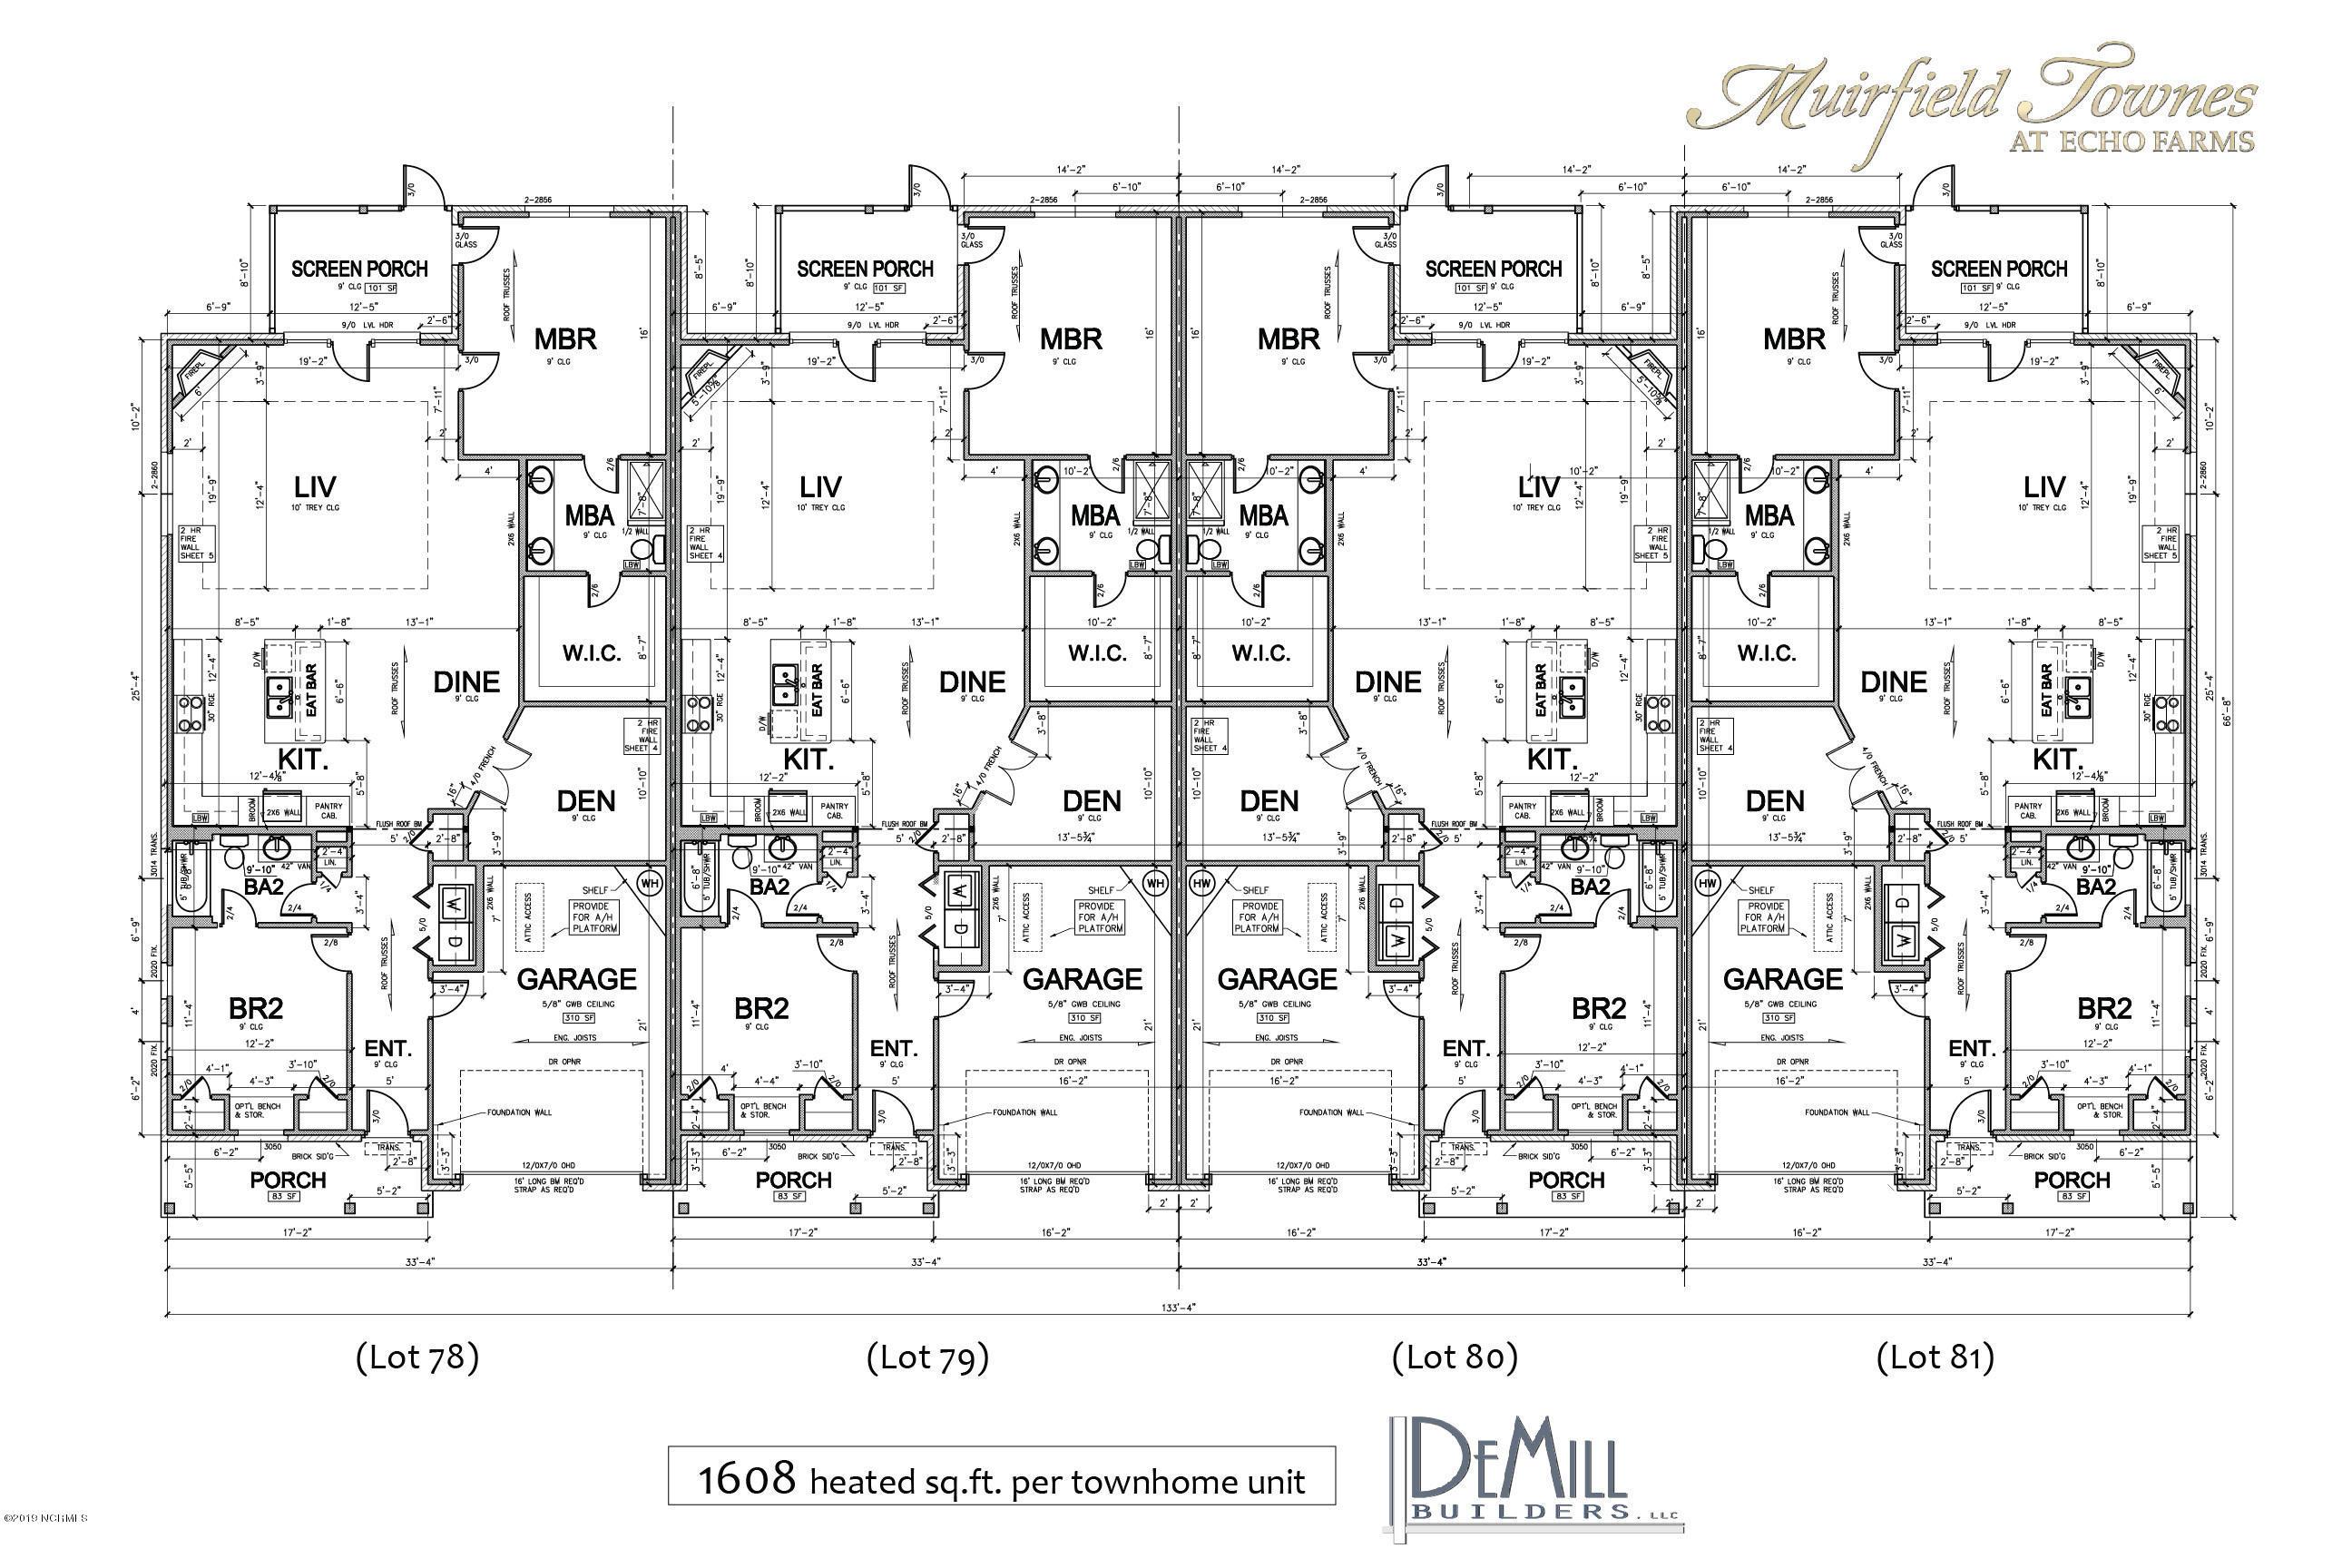 4316 Terrington Drive, Wilmington, North Carolina, 2 Bedrooms Bedrooms, 5 Rooms Rooms,2 BathroomsBathrooms,Townhouse,For sale,Terrington,100103083